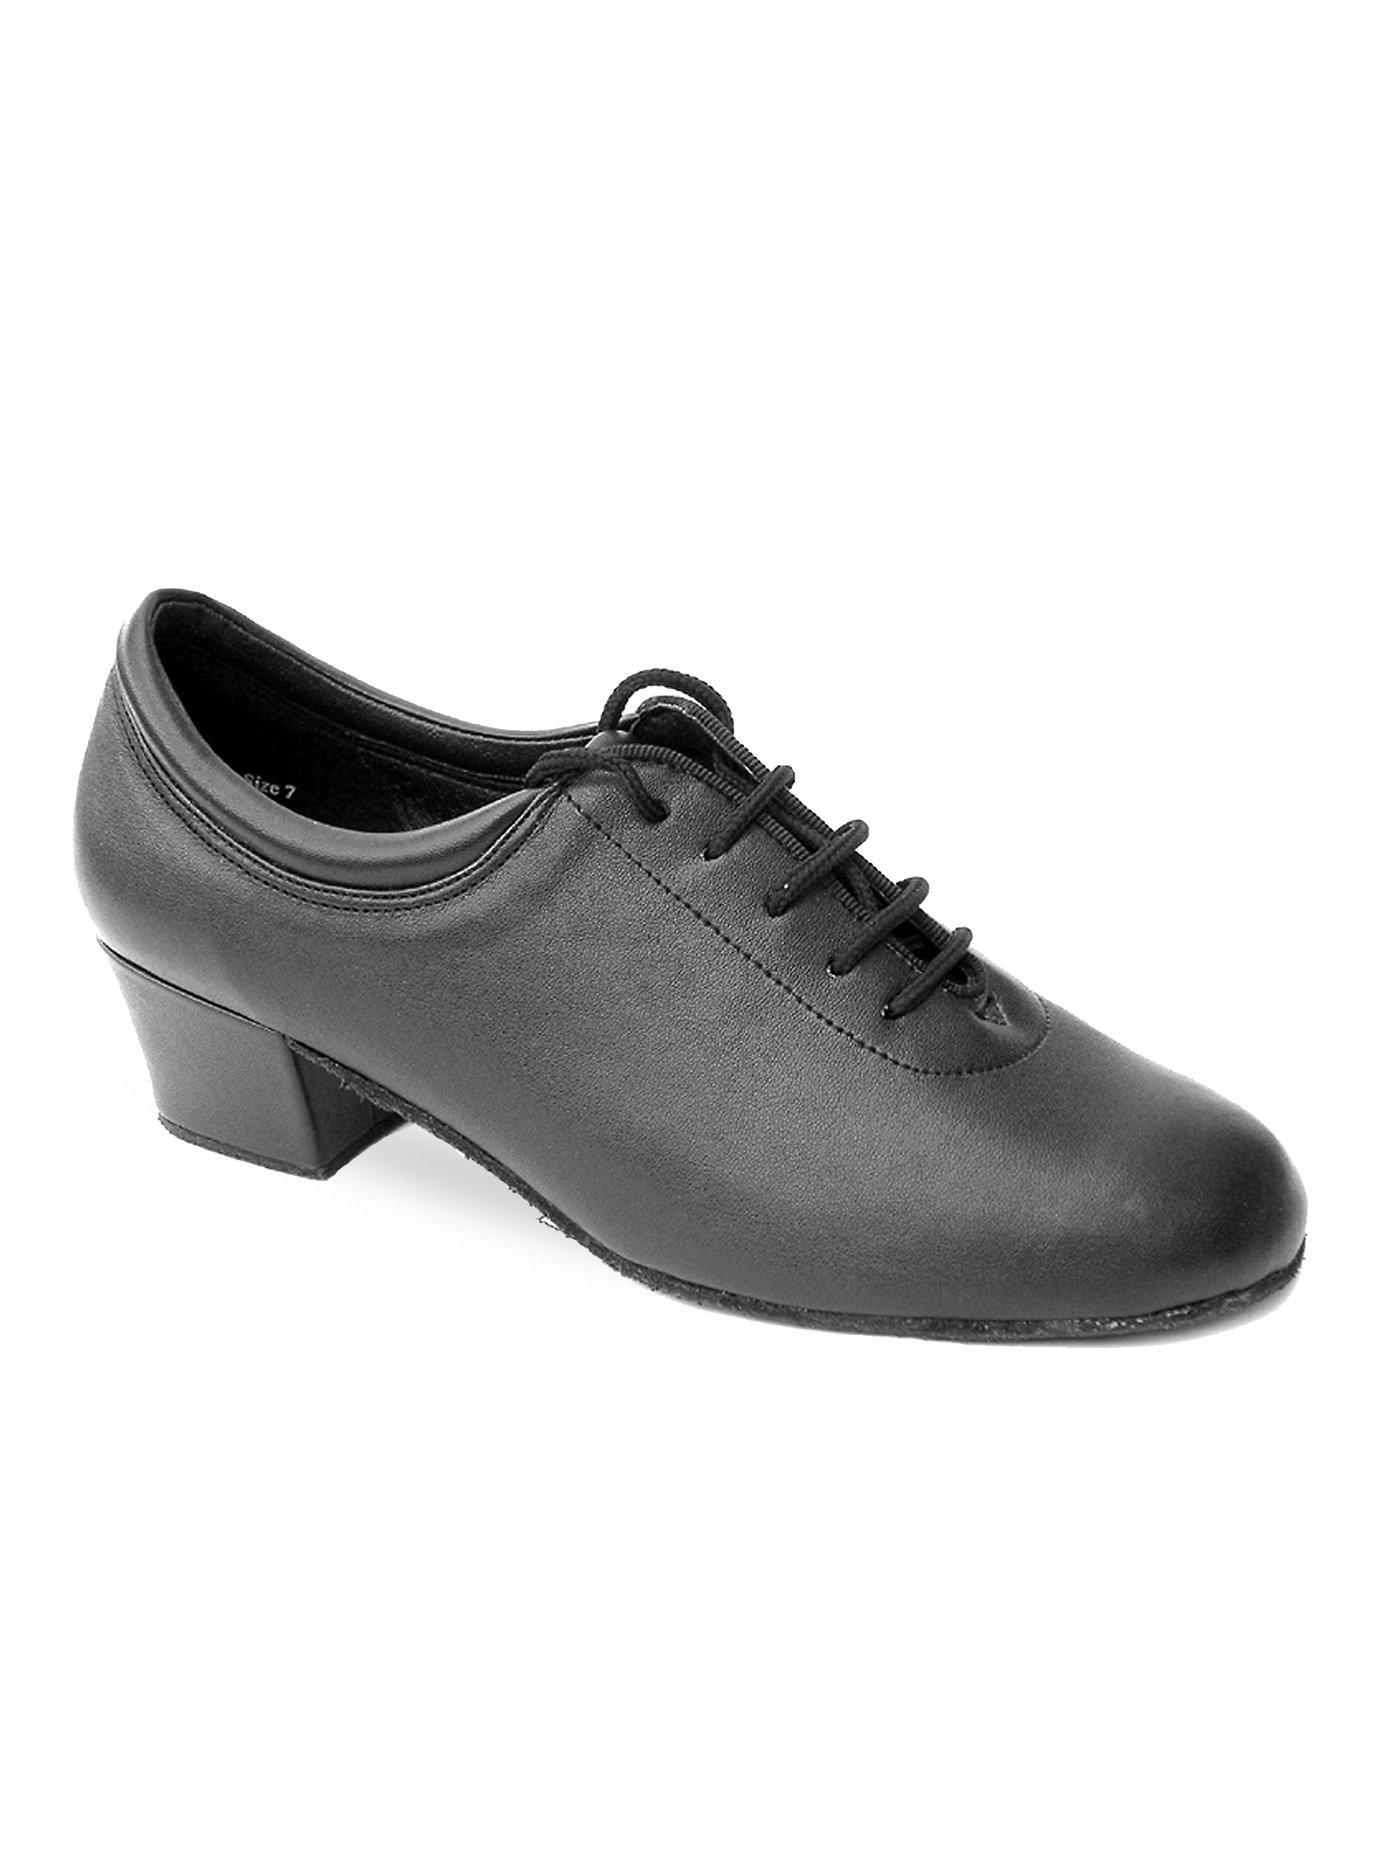 Ladies Practice/Cuban- Classic Ballroom Shoes,2601BL15075,Black Leather,7.5